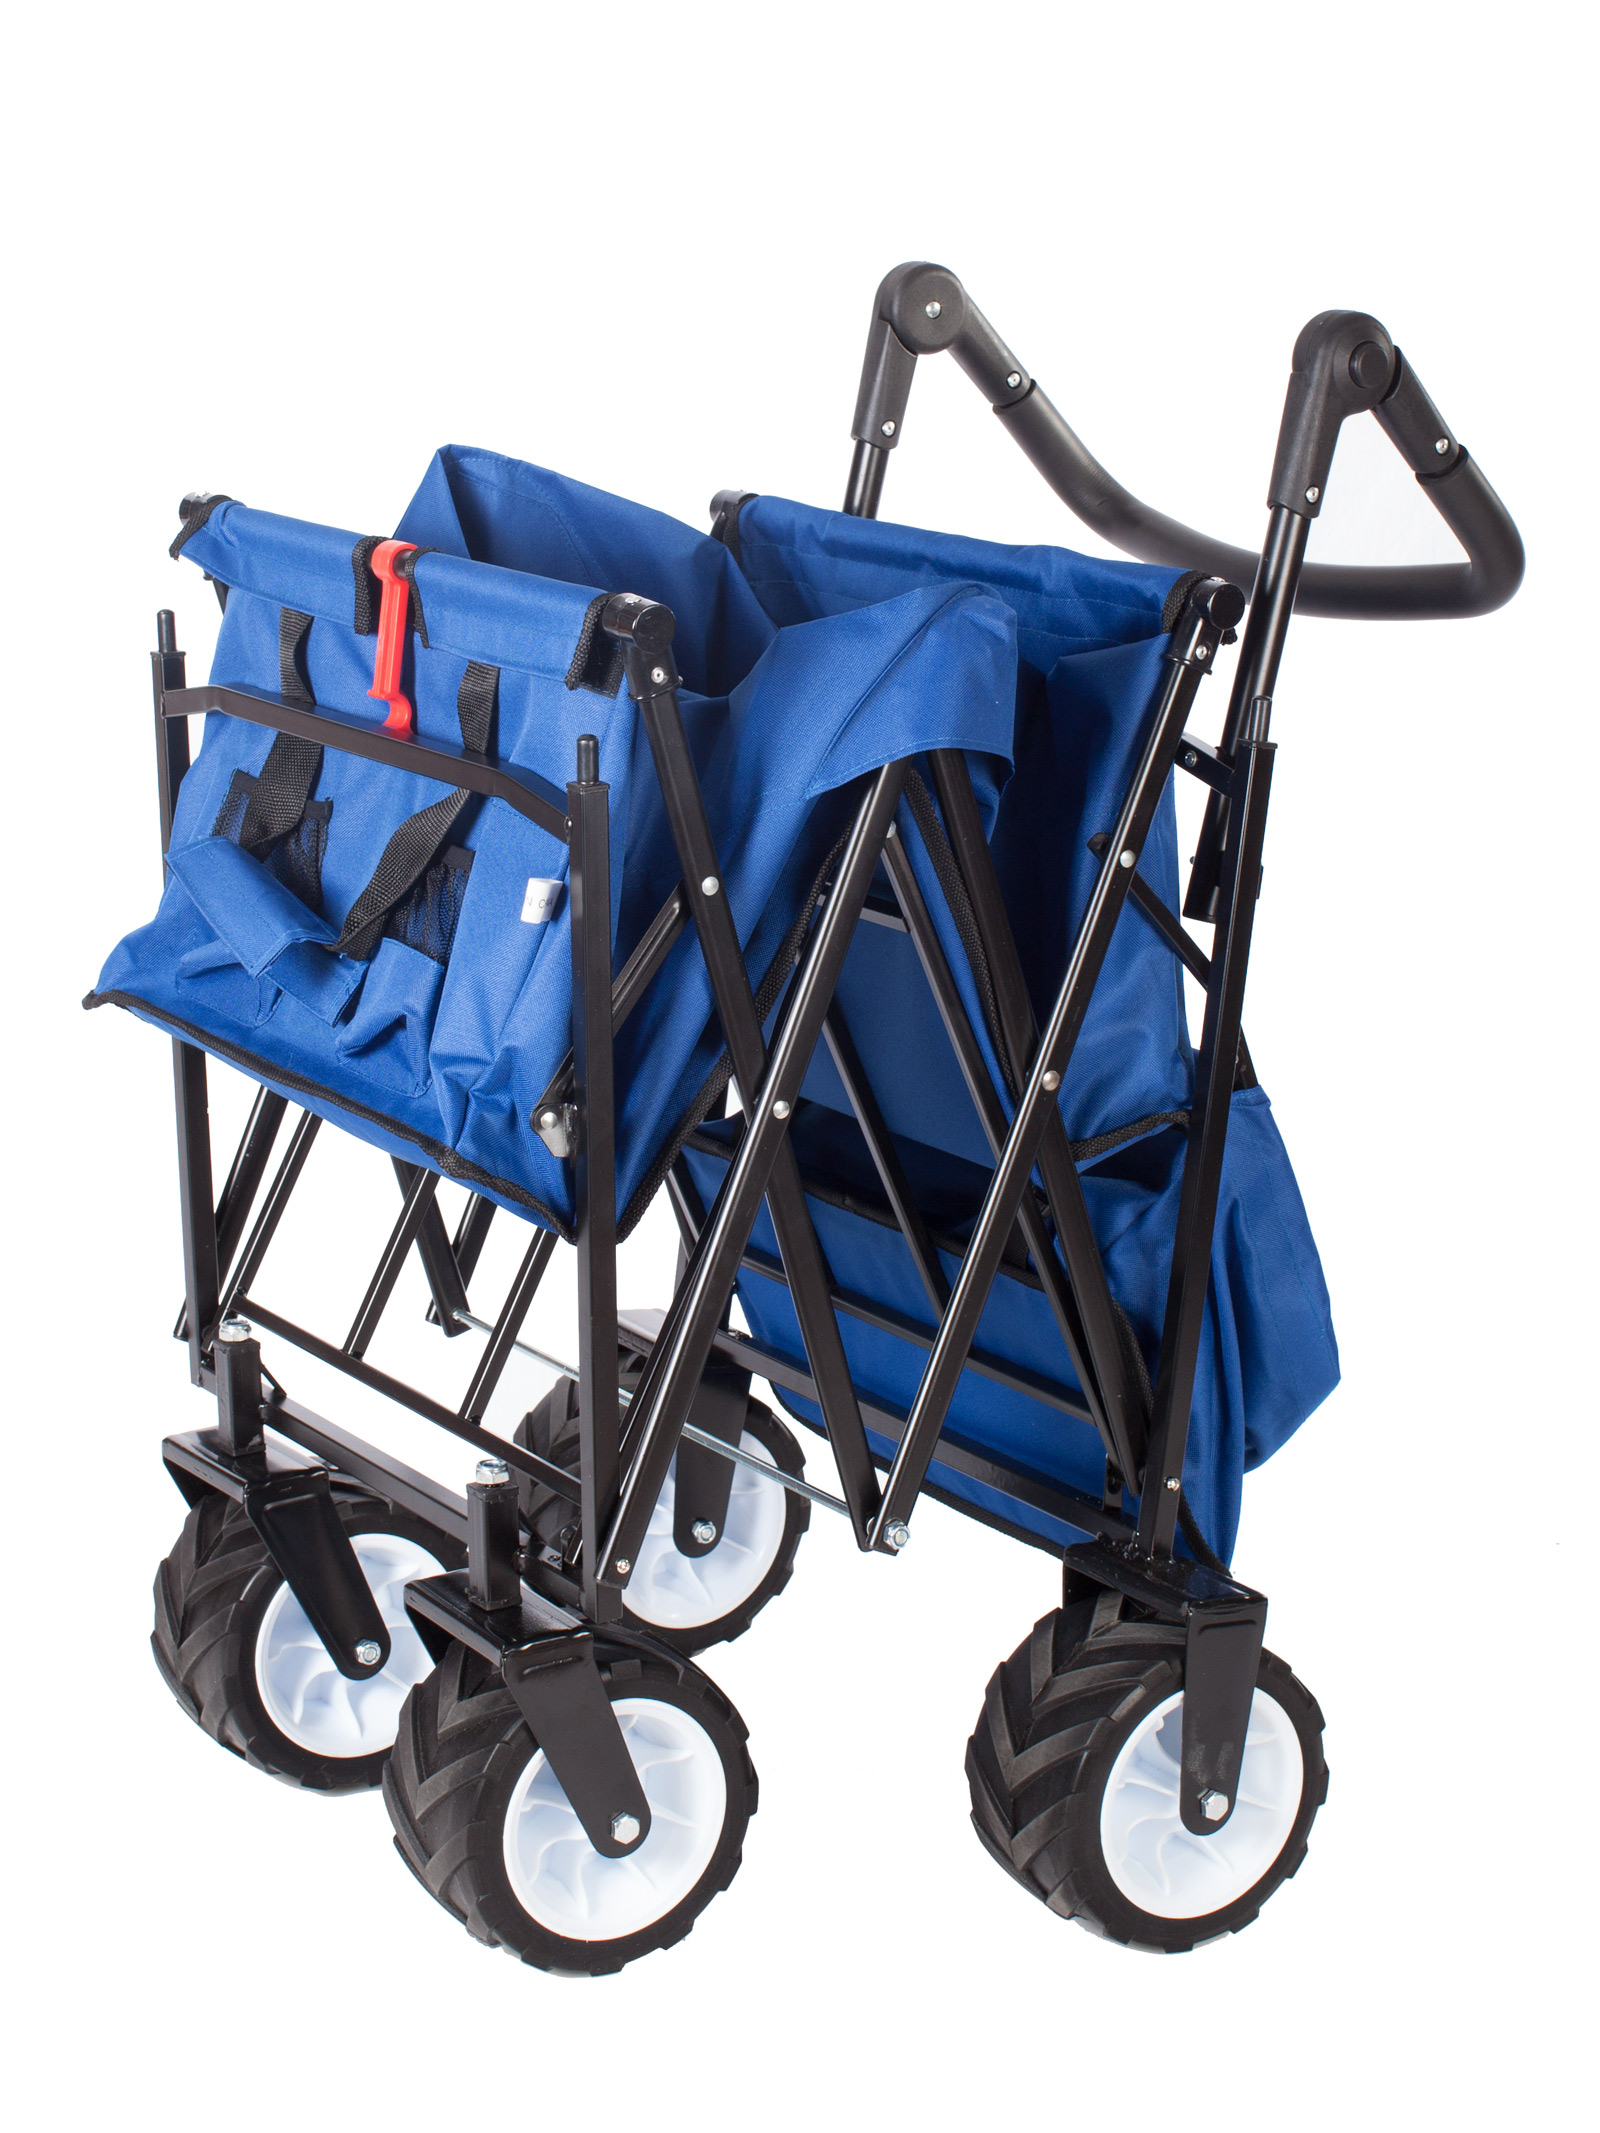 blue outdoor push folding wagon canopy garden utility travel cart all terrain ebay. Black Bedroom Furniture Sets. Home Design Ideas